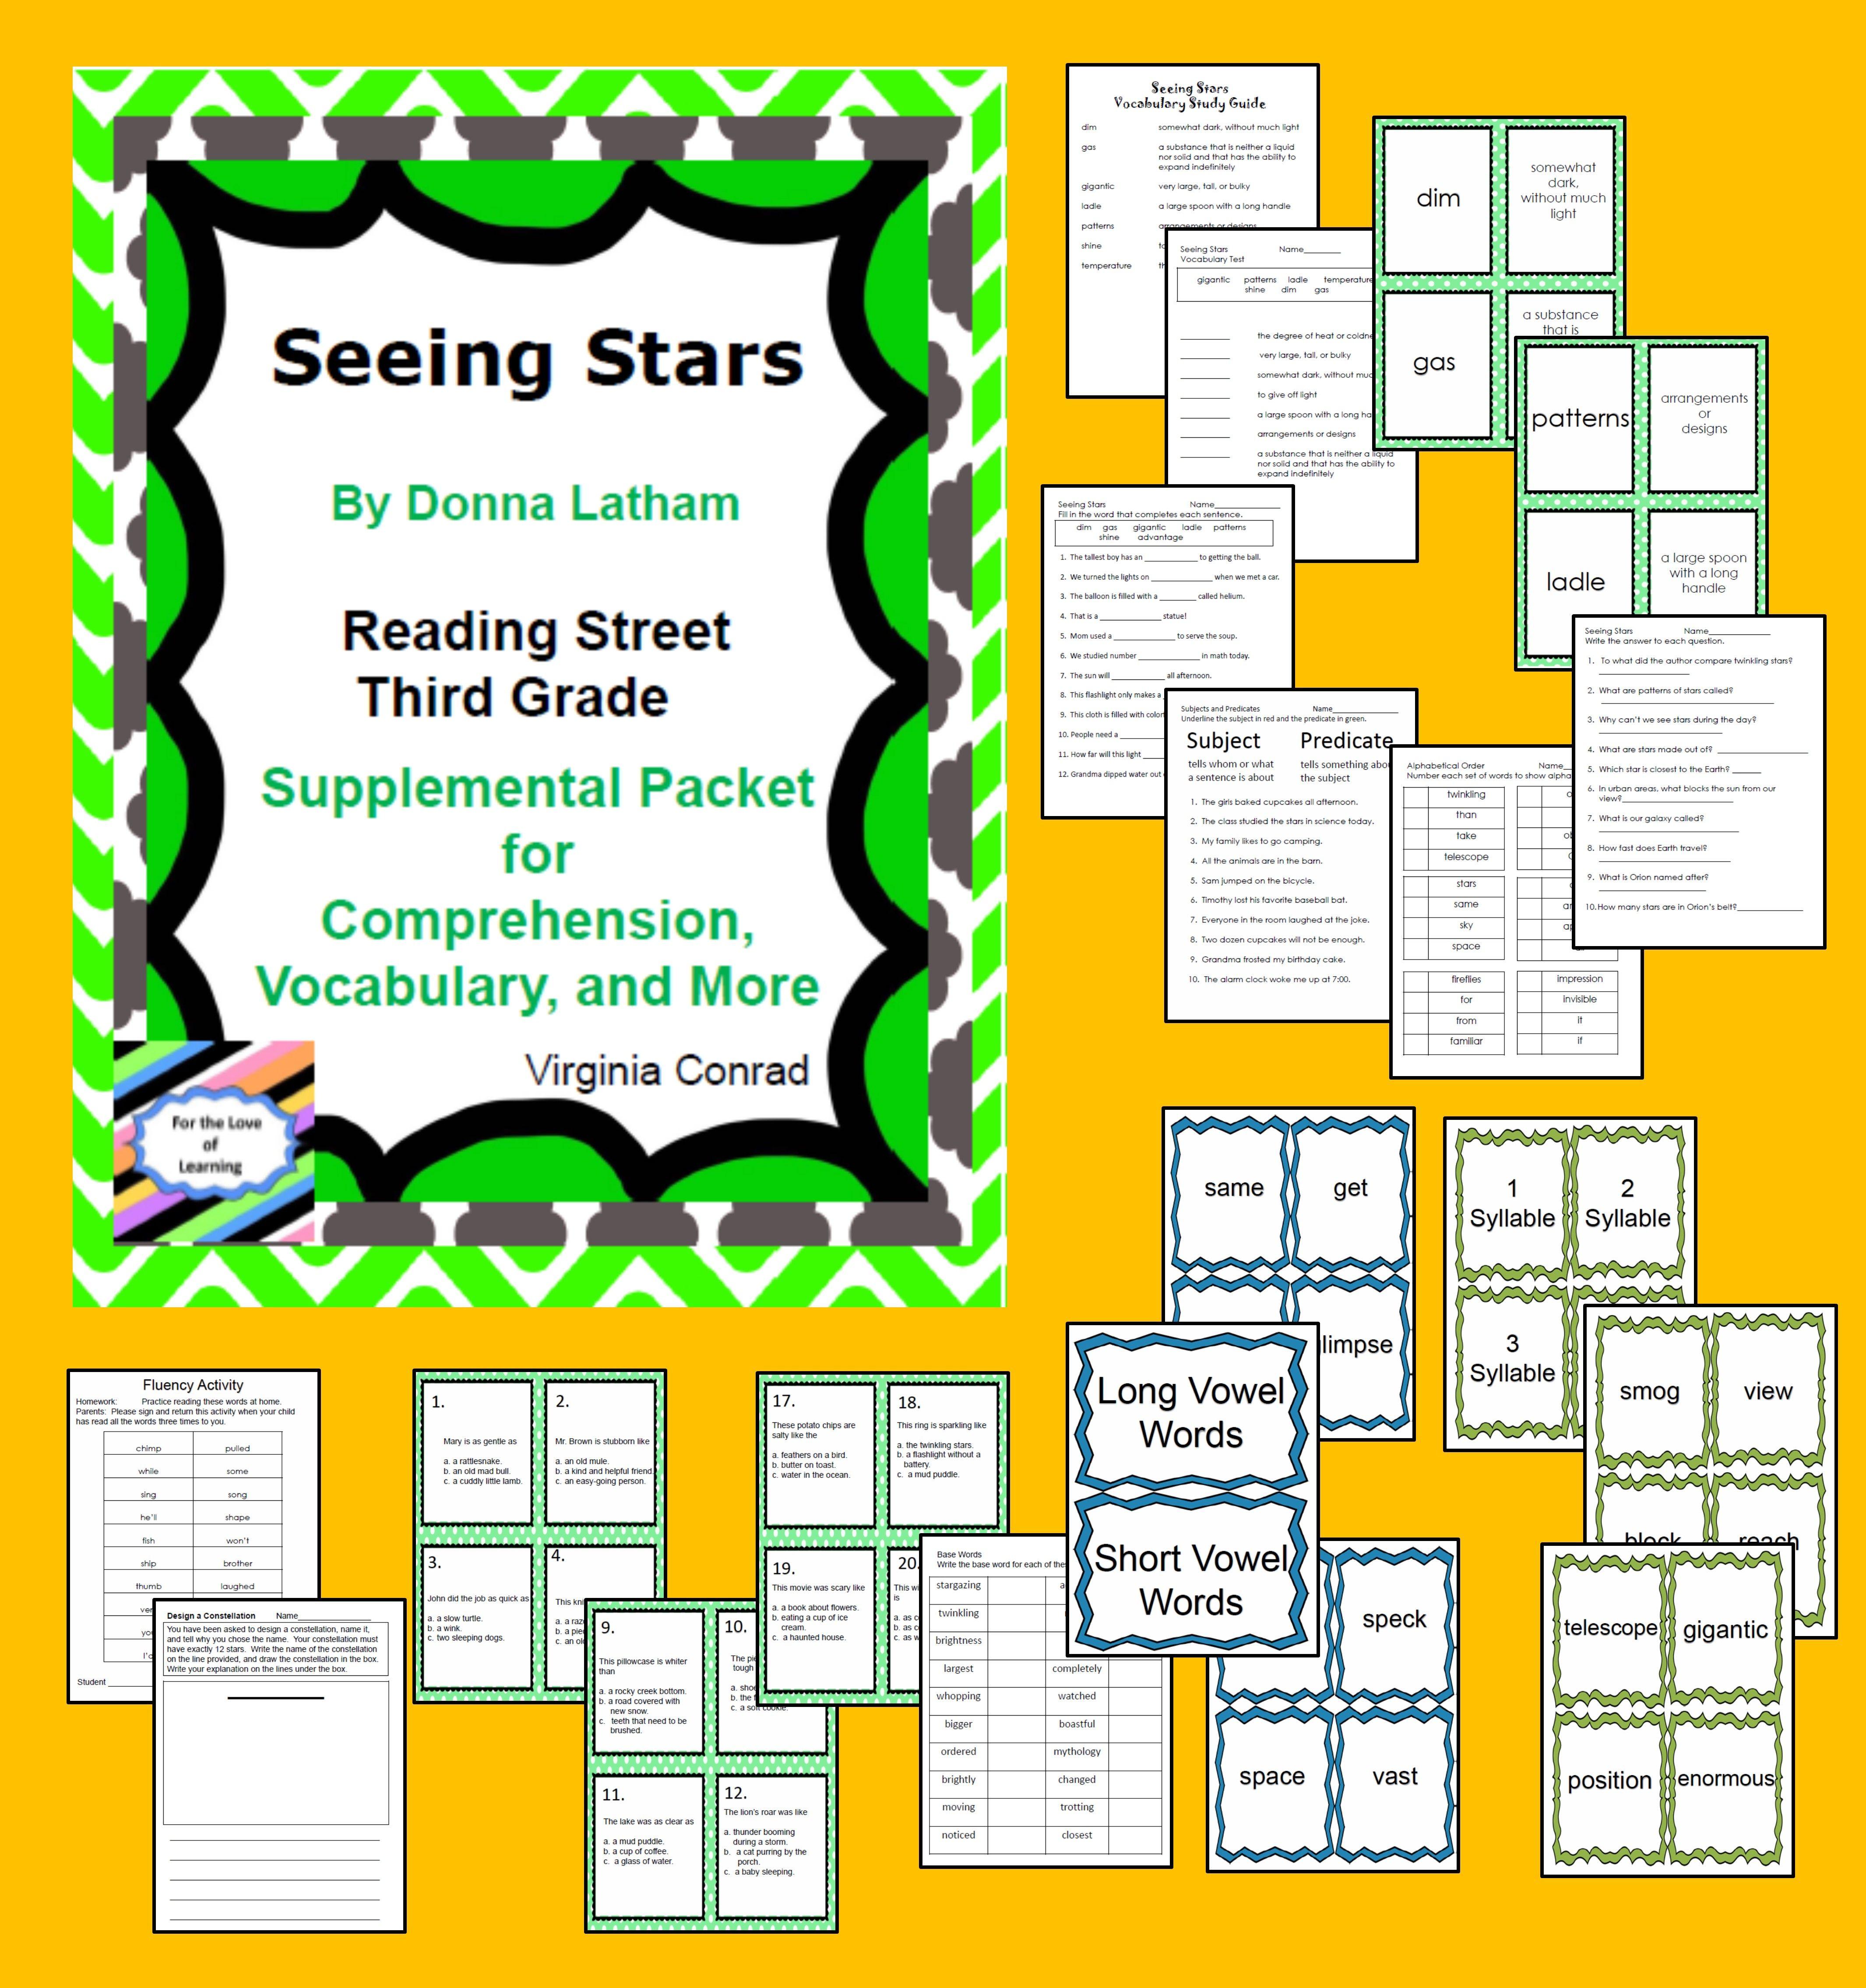 Seeing Stars Supplemental Packet Reading Street Third